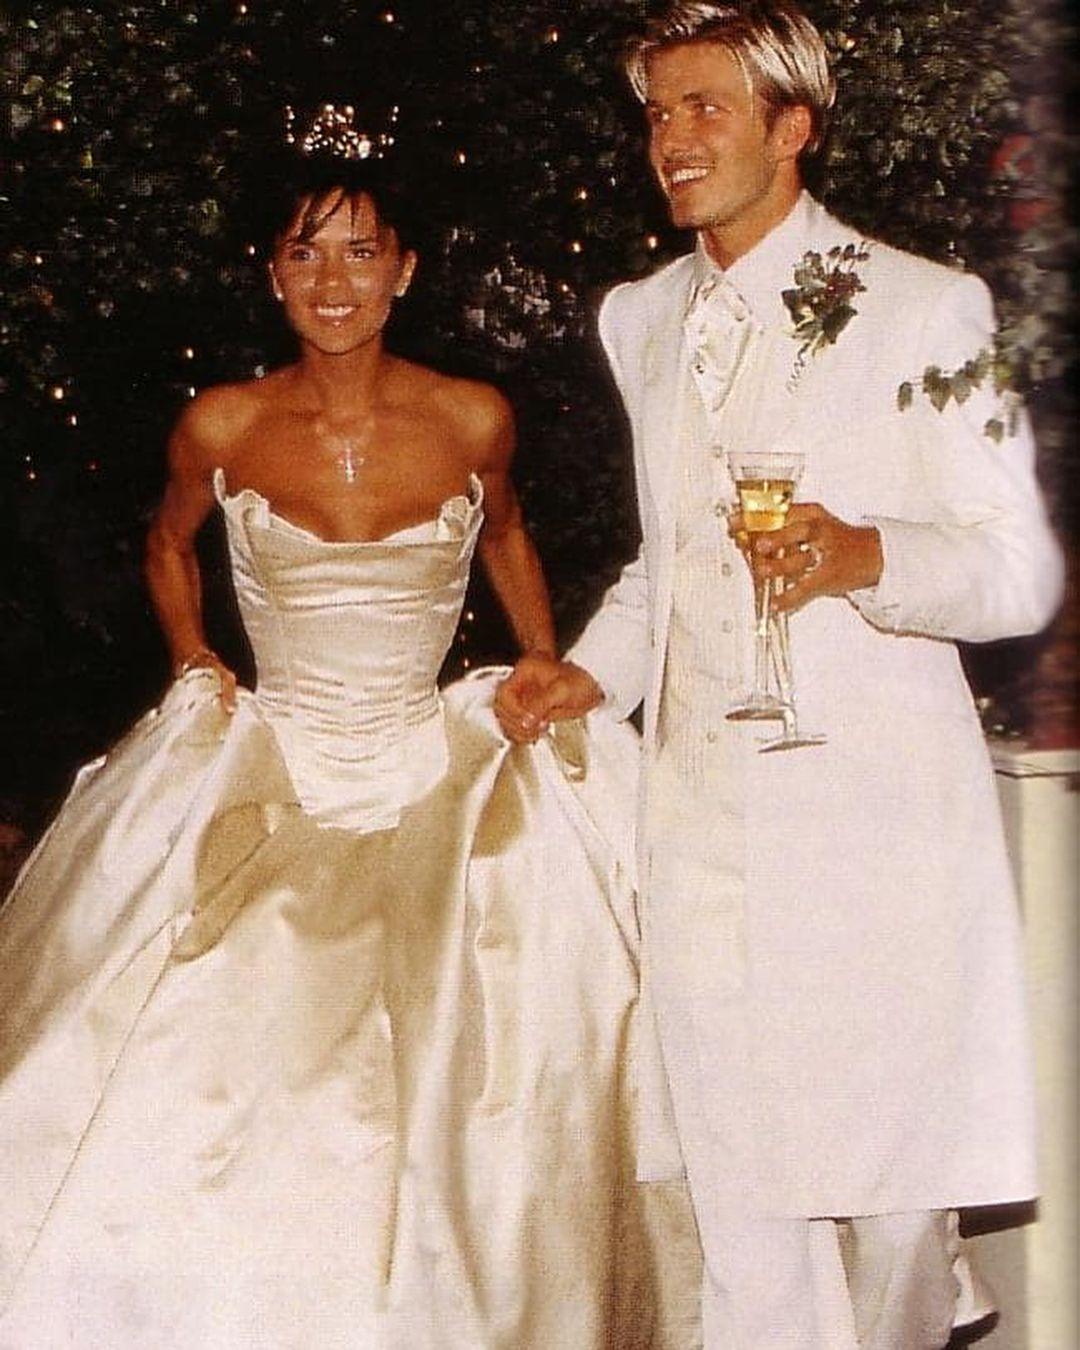 David Beckham And Victoria Beckham On Their Wedding Day